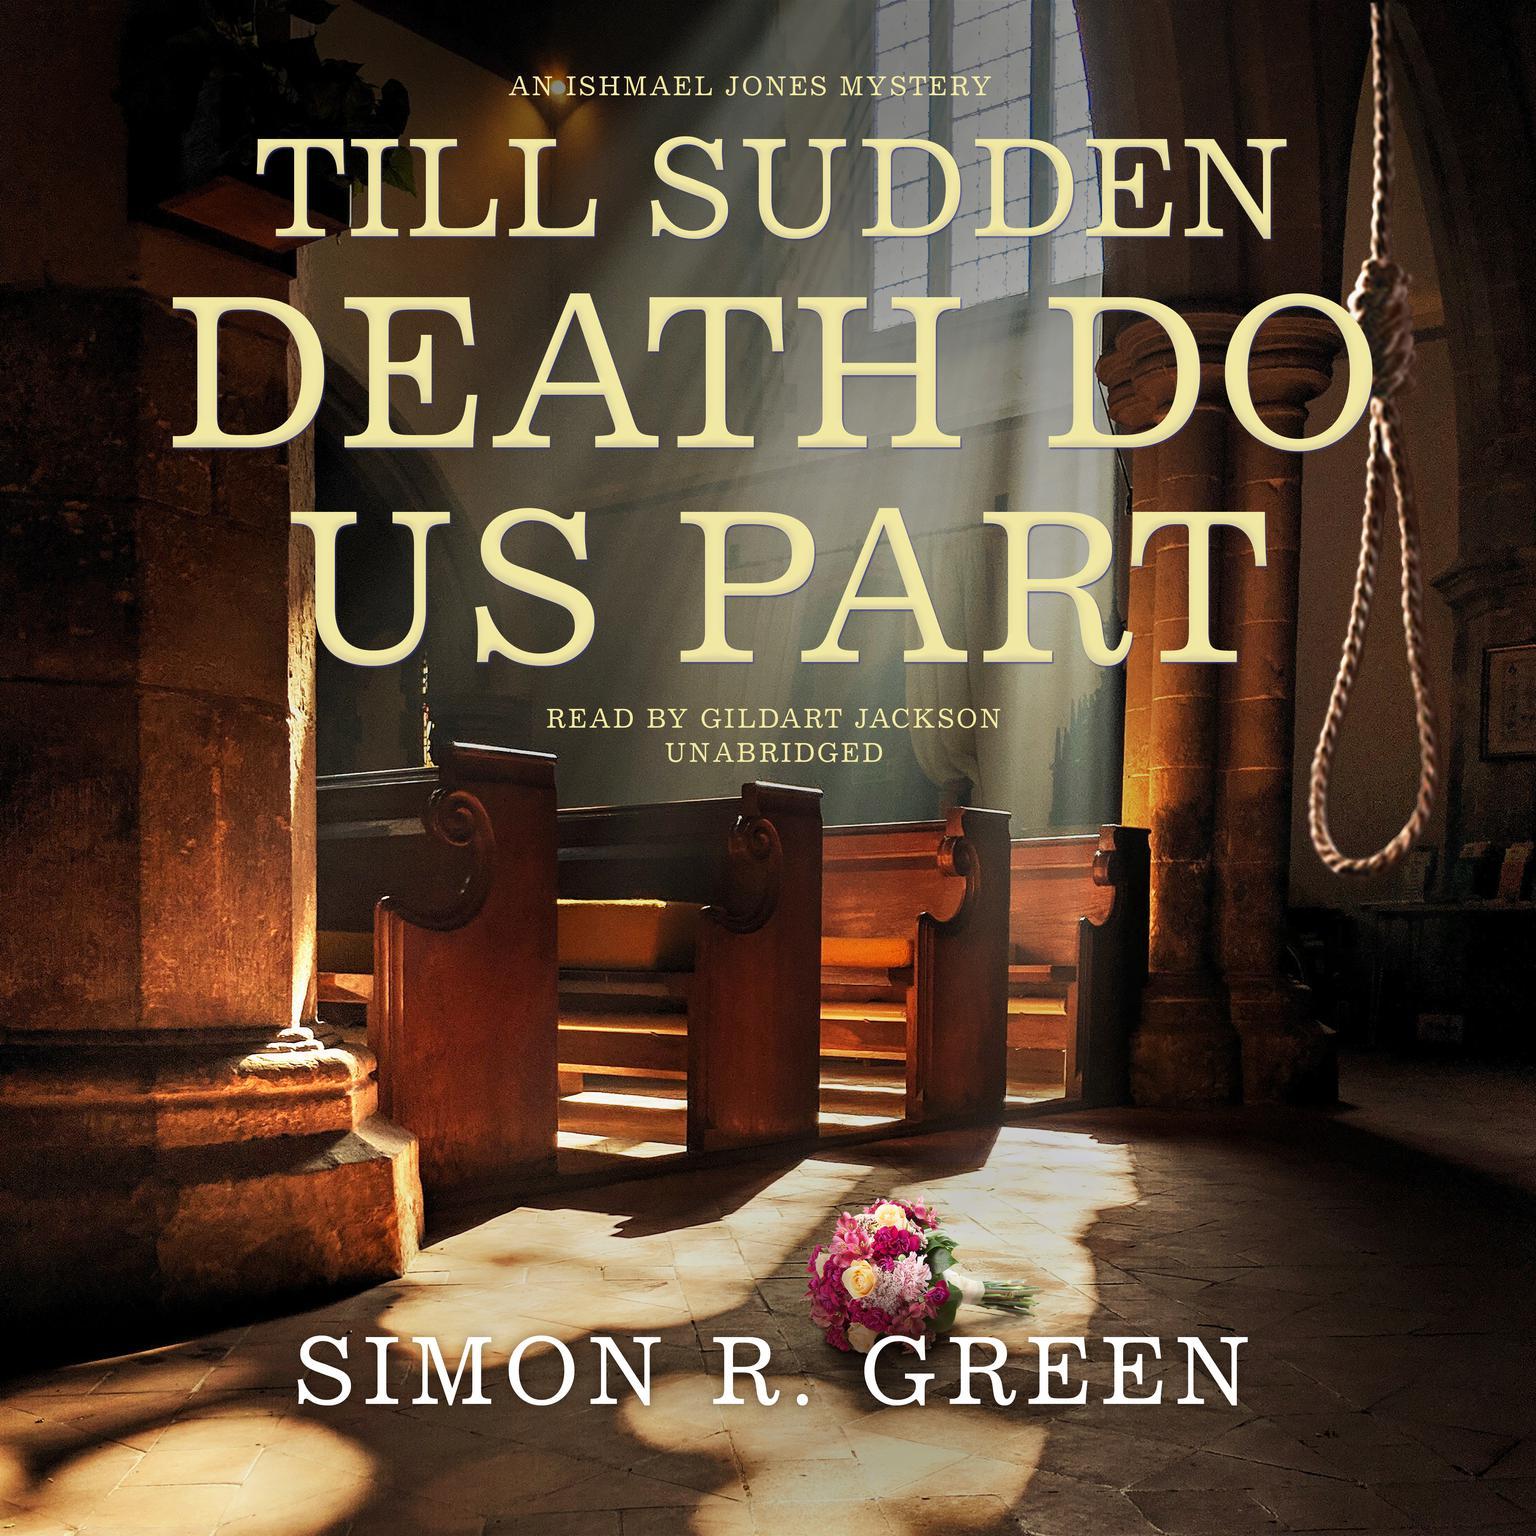 Till Sudden Death Do Us Part: An Ishmael Jones Mystery Audiobook, by Simon R. Green